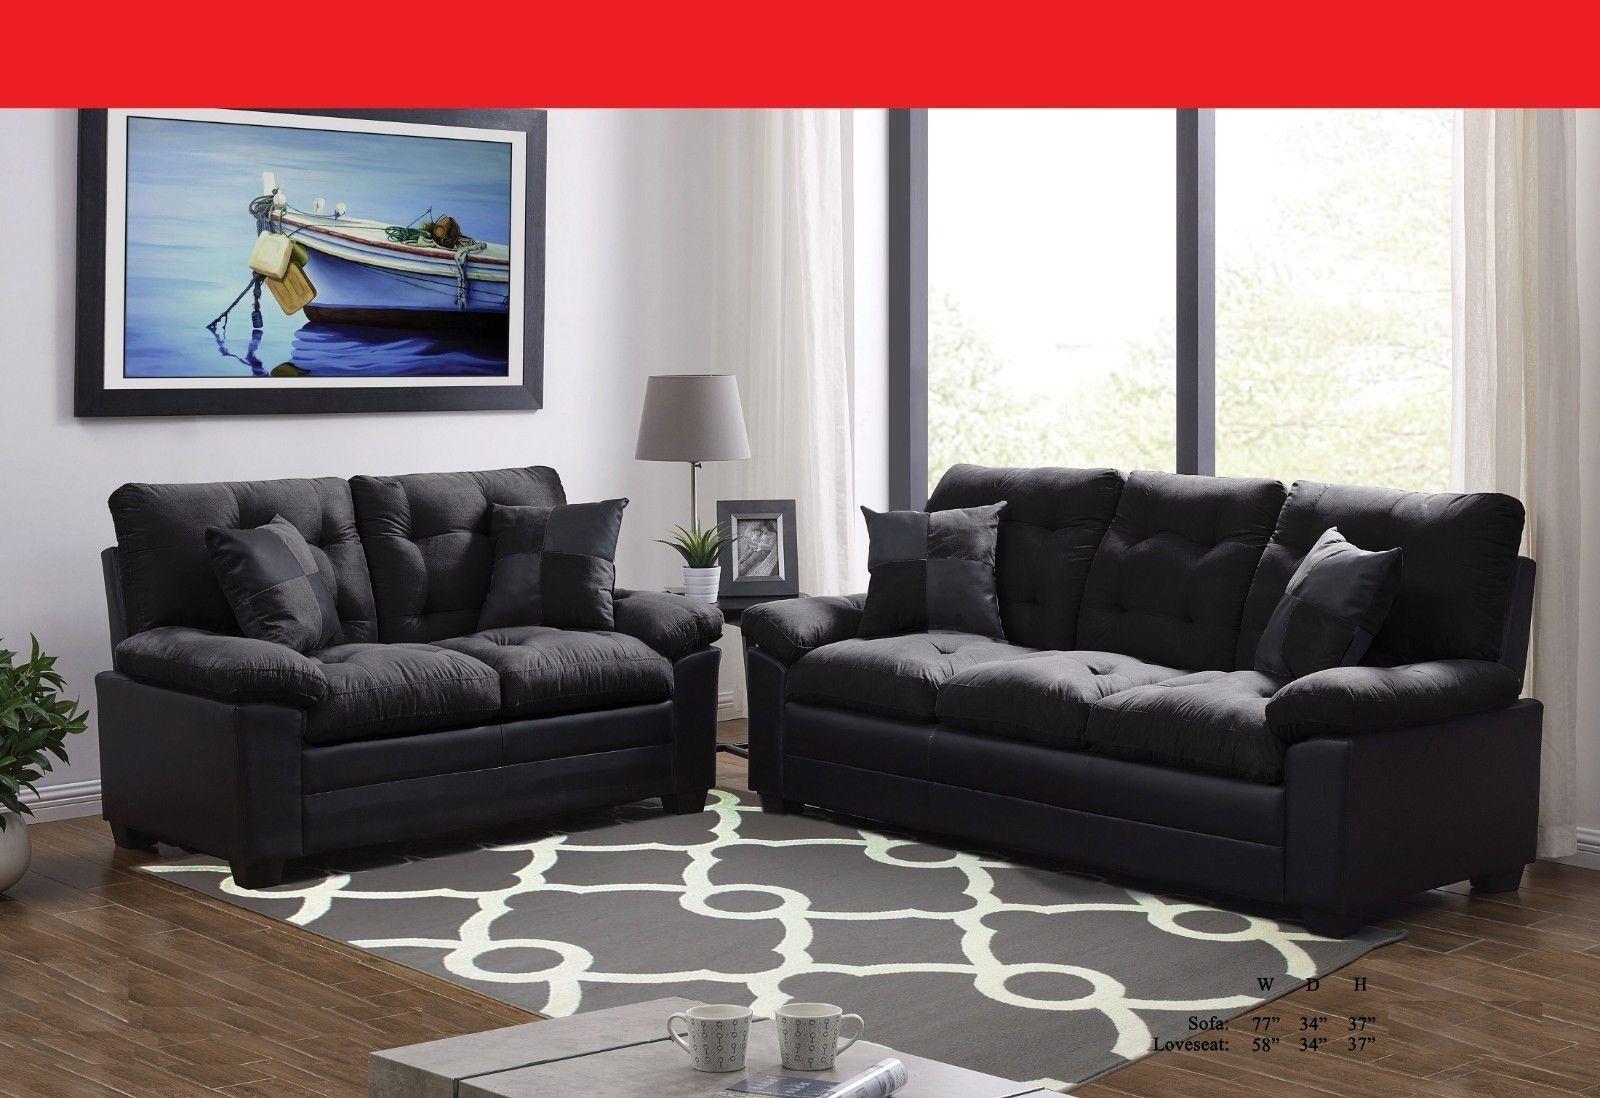 Living Room Plush Cushion Tufted Sofa And Loveseat Black Microfiber 2pc Sofa Set Microfiber Couch Ideas Of Microfiber Couch Mi Cushions On Sofa Sofa